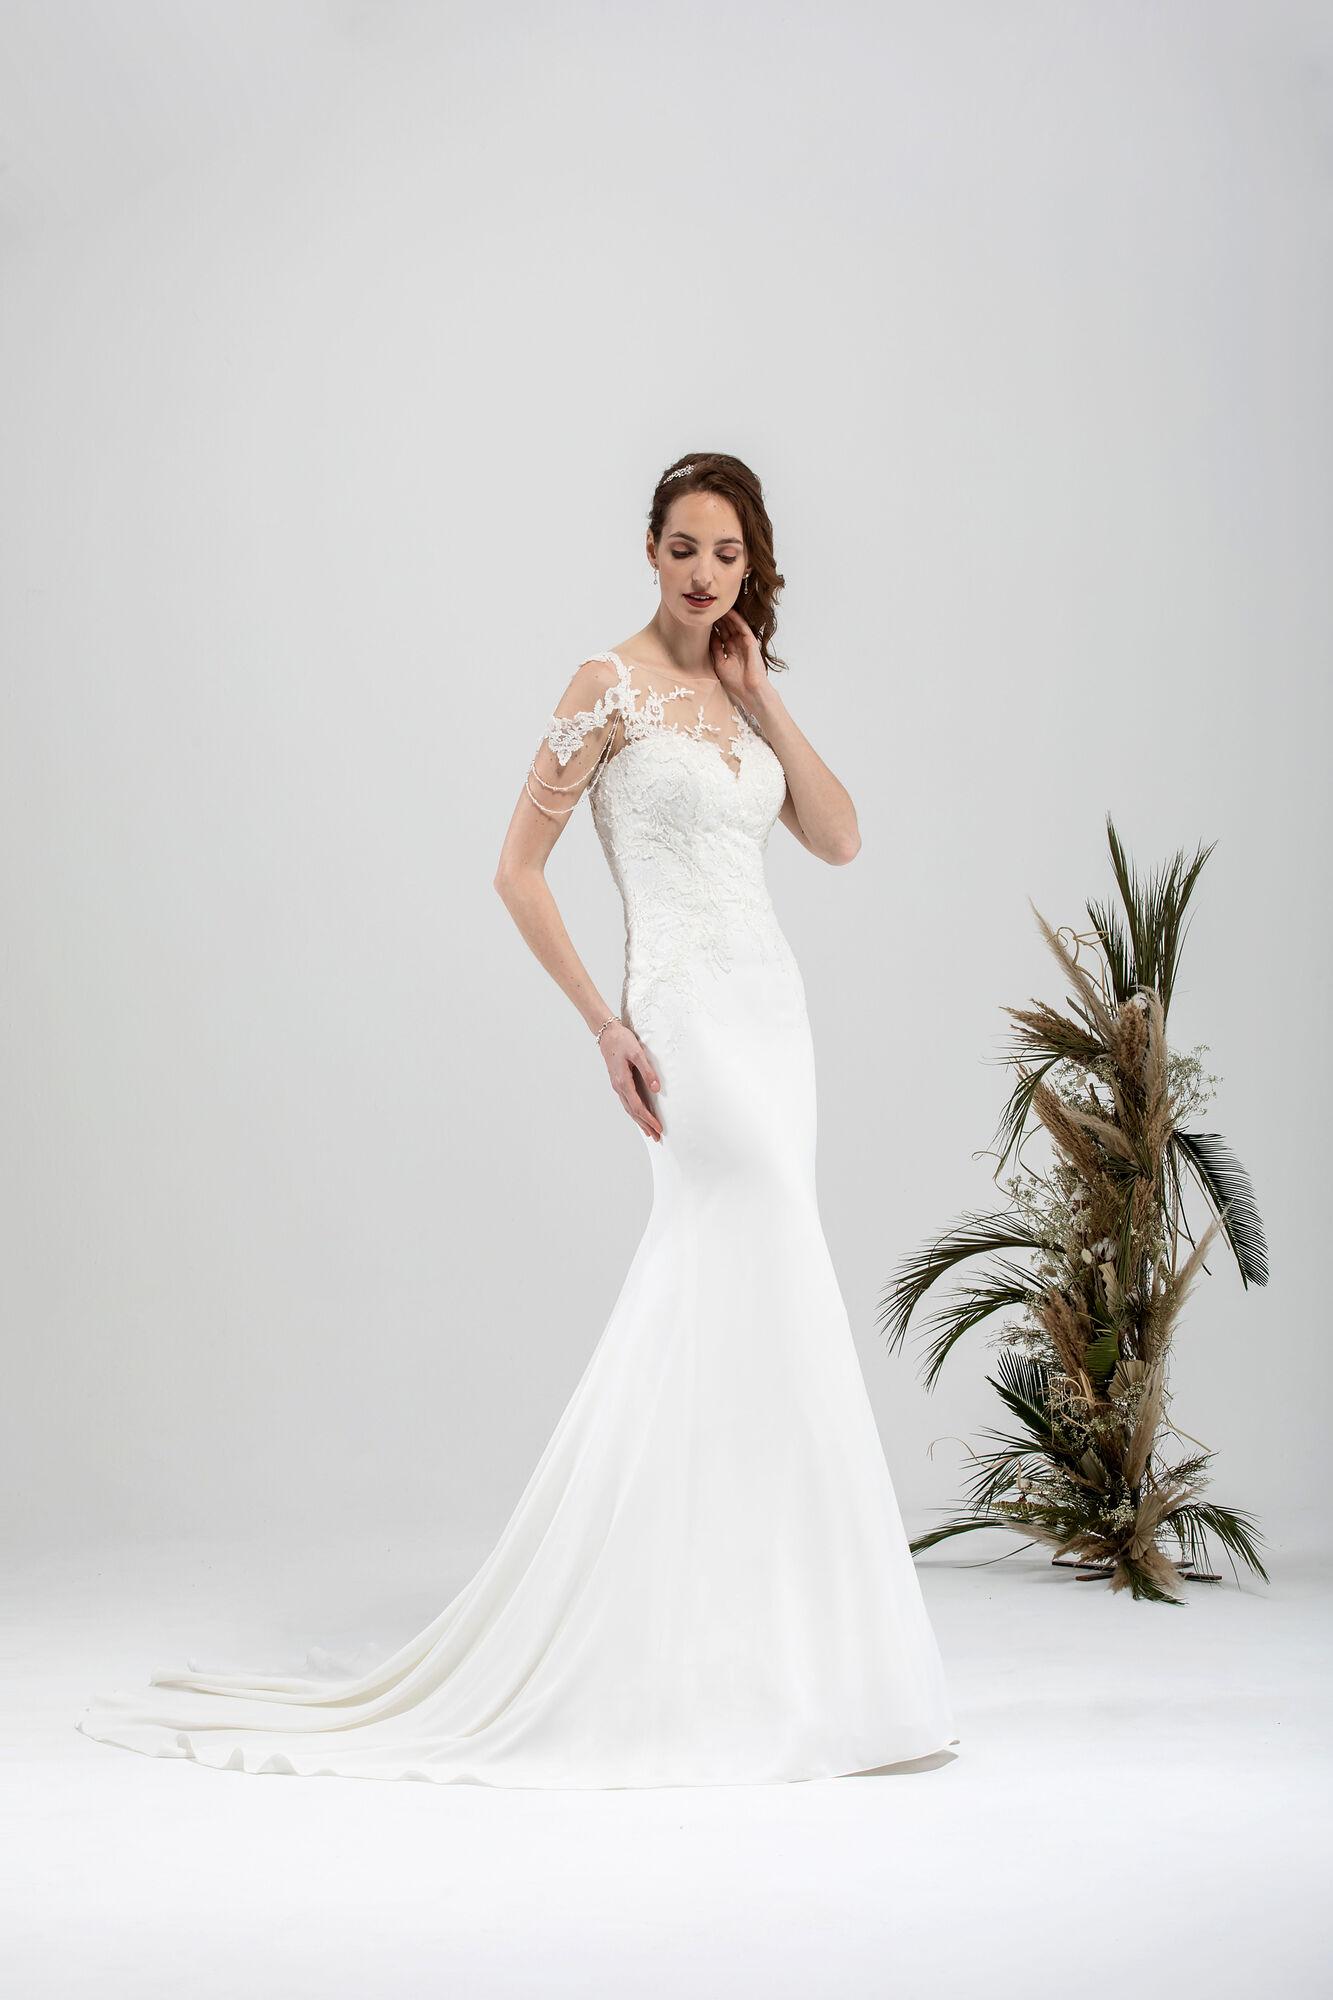 robe de mariée droite,robe de mariée jupe